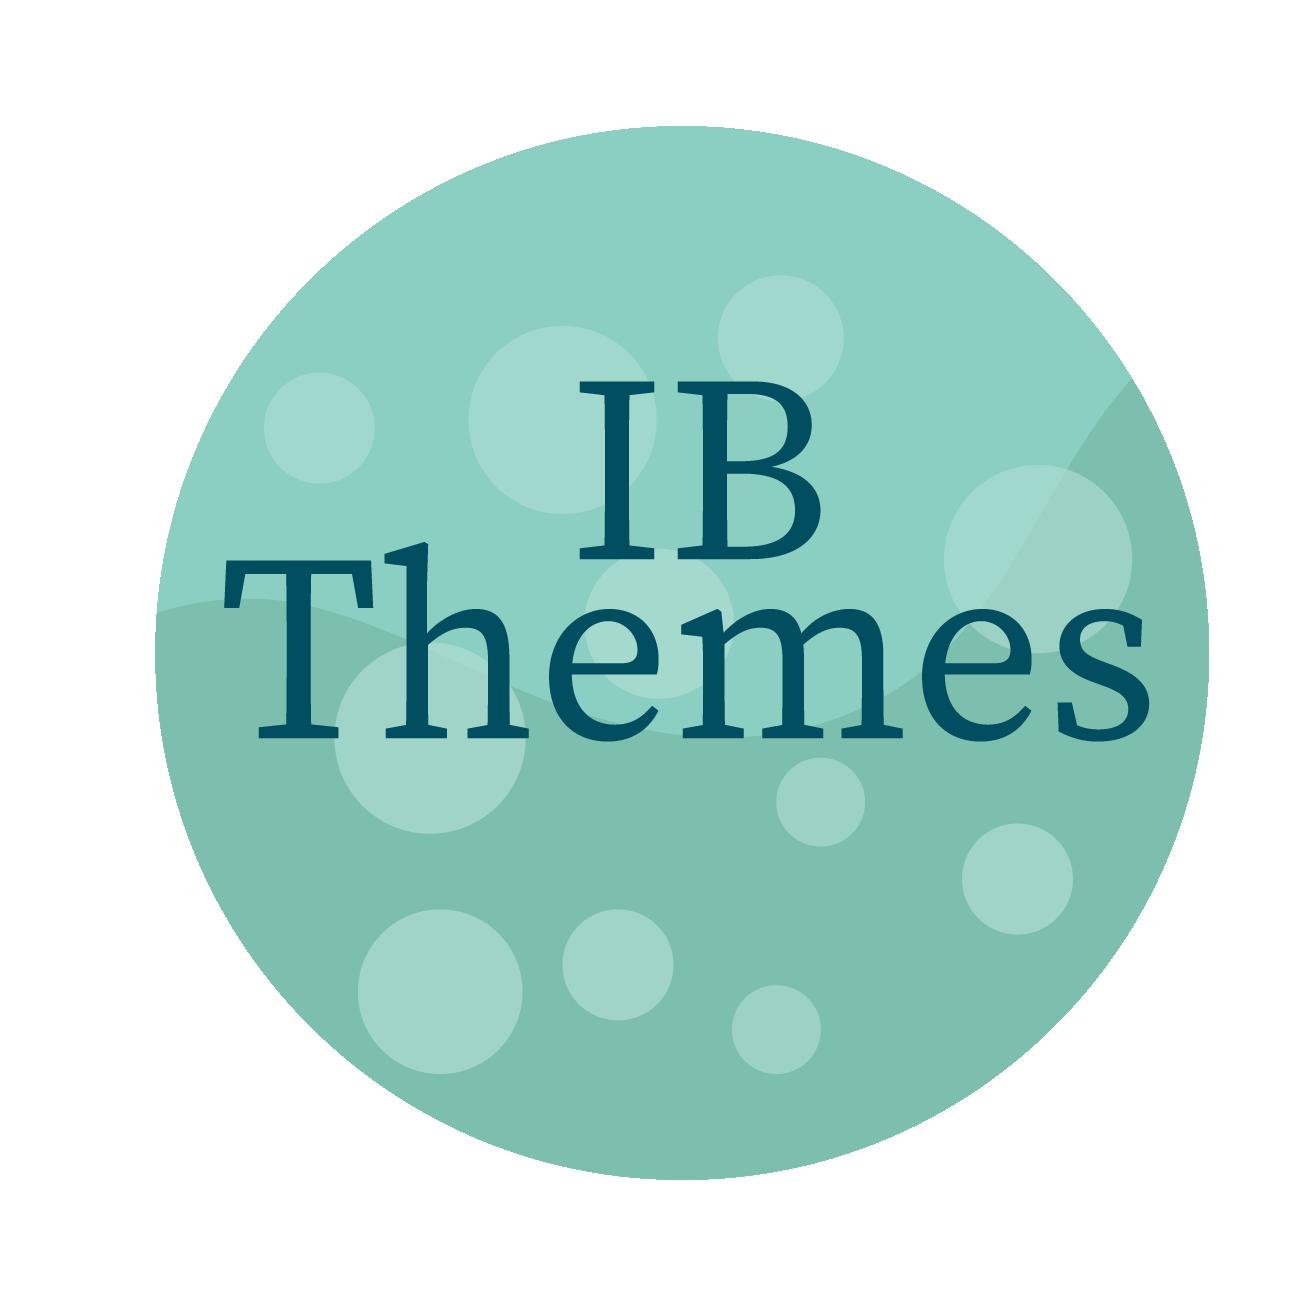 By Transdisciplinary theme (PYP)